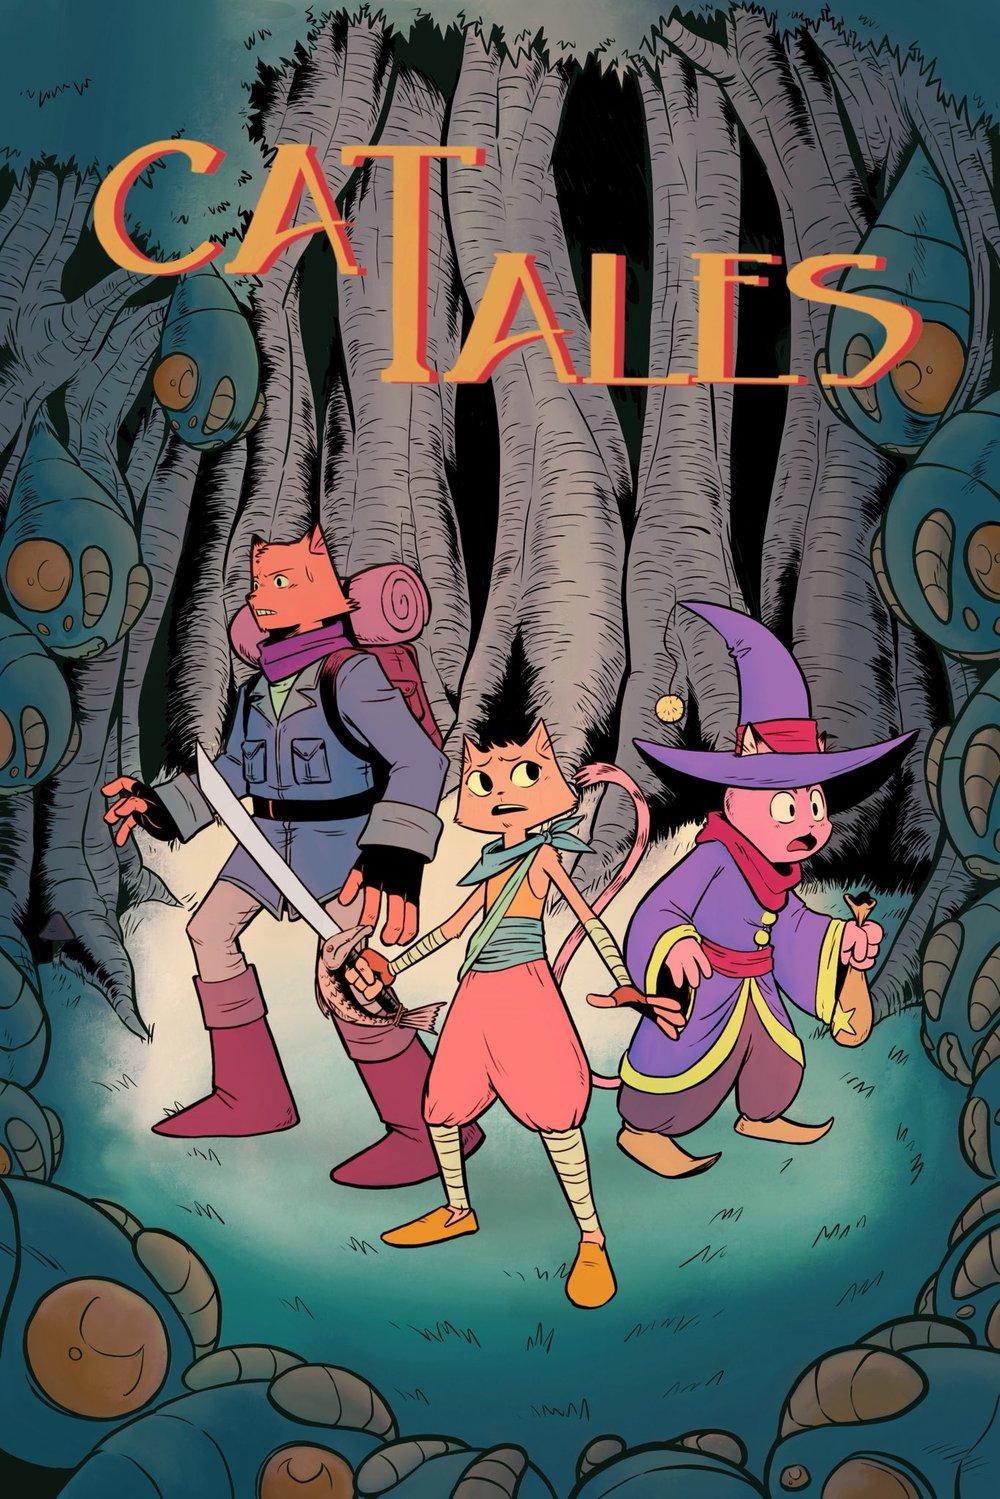 Cat Tales Cover 01.jpg